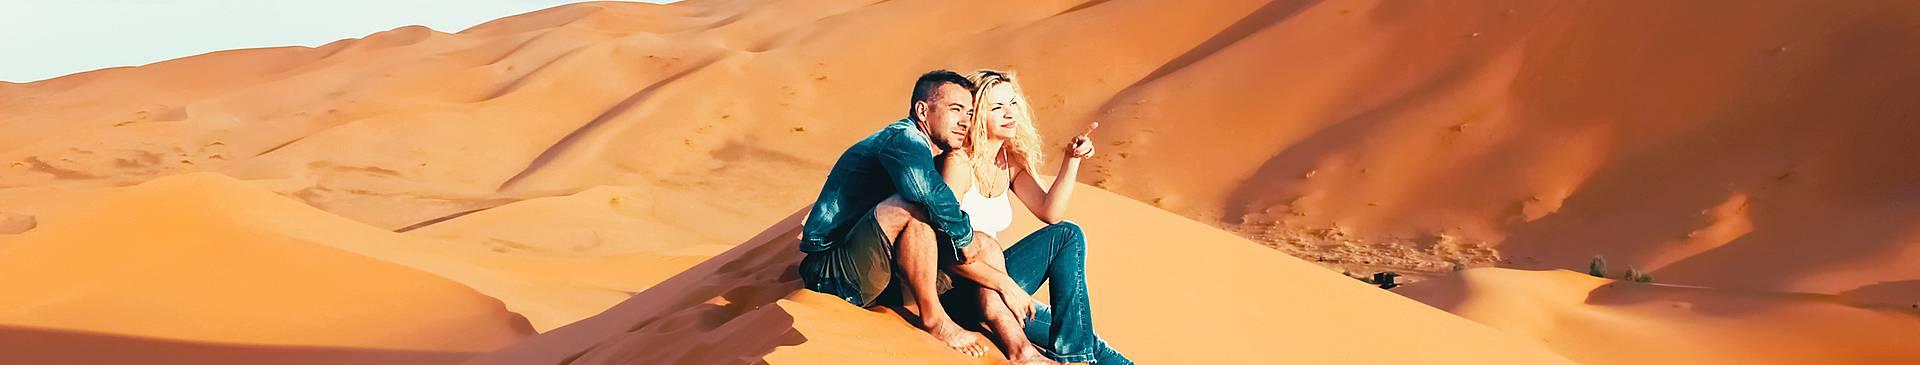 Morocco romantic getaways